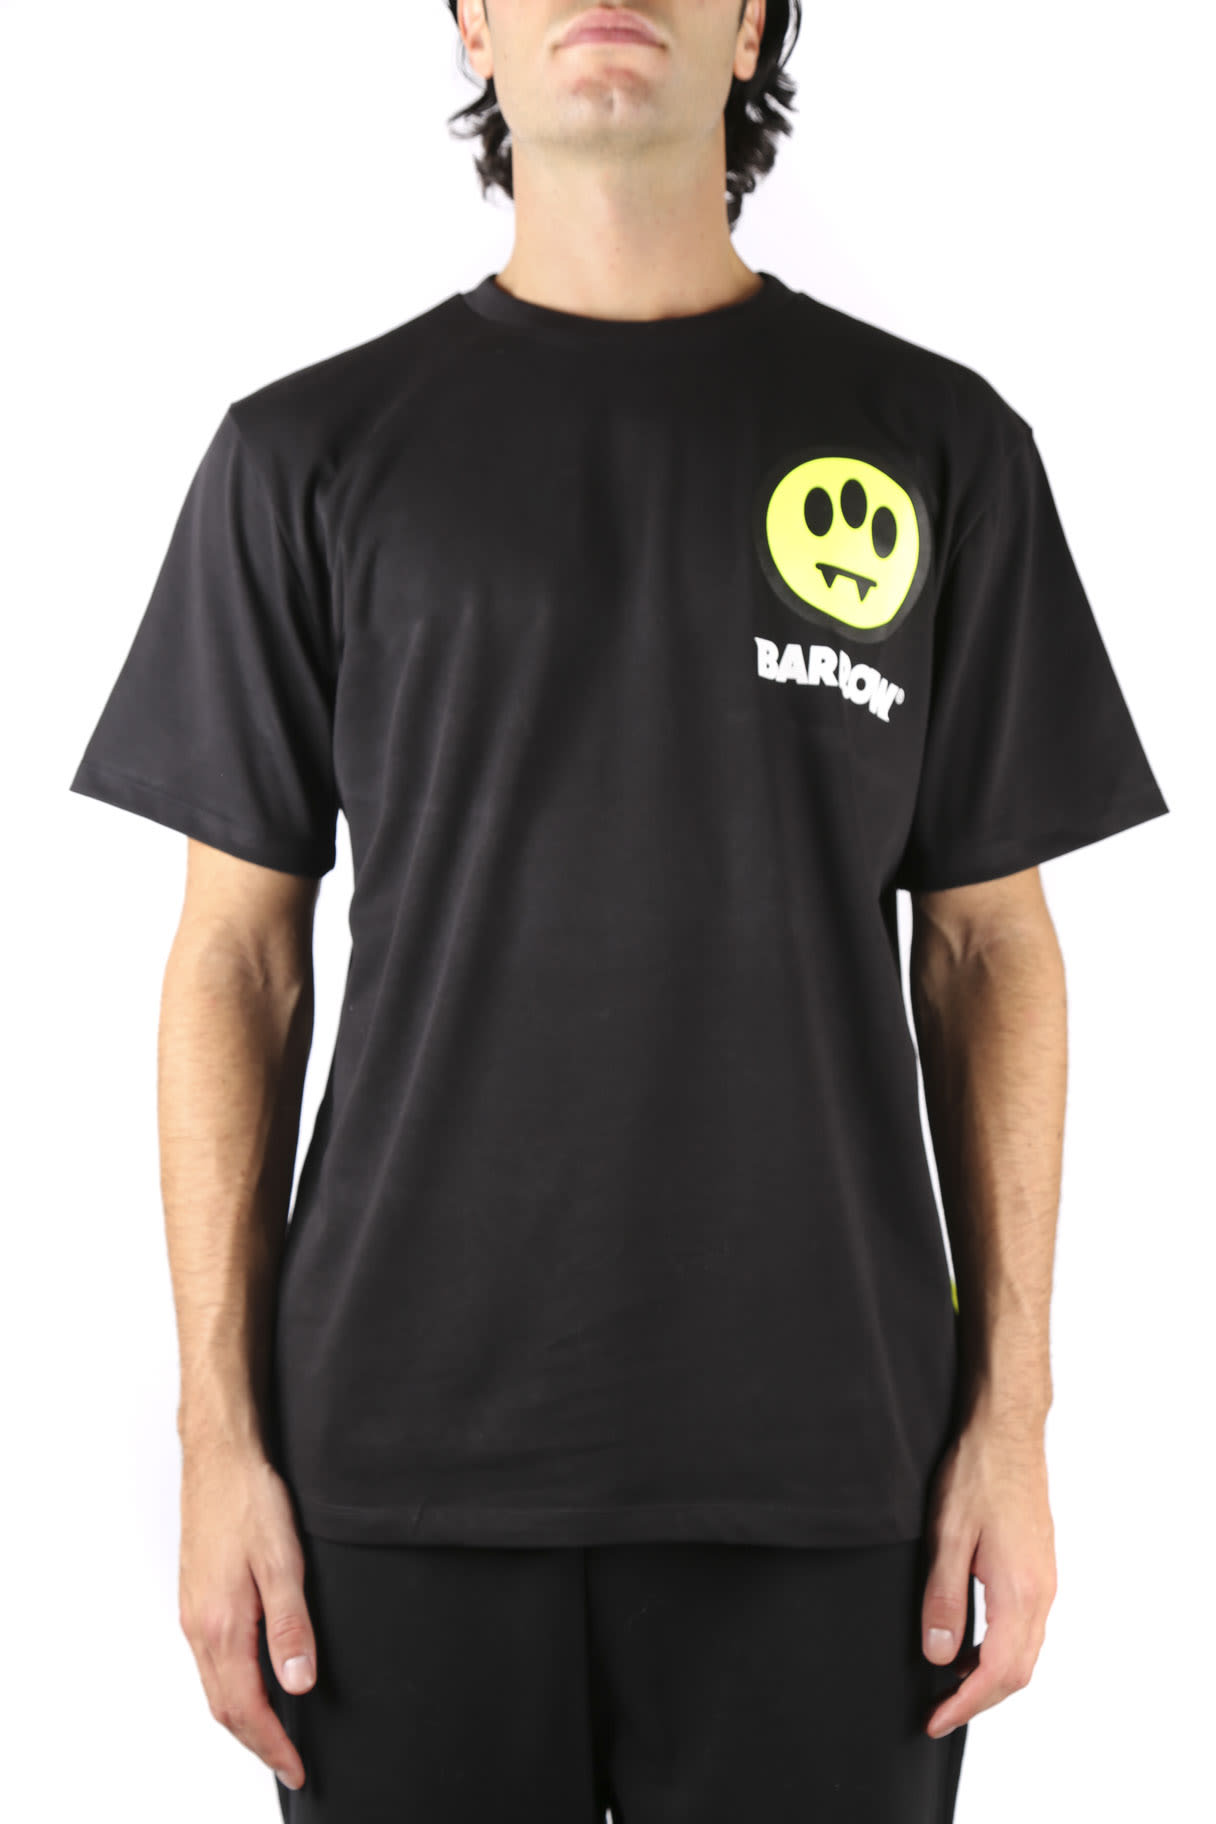 Barrow Barrow Invasion T-shirt In Black Cotton